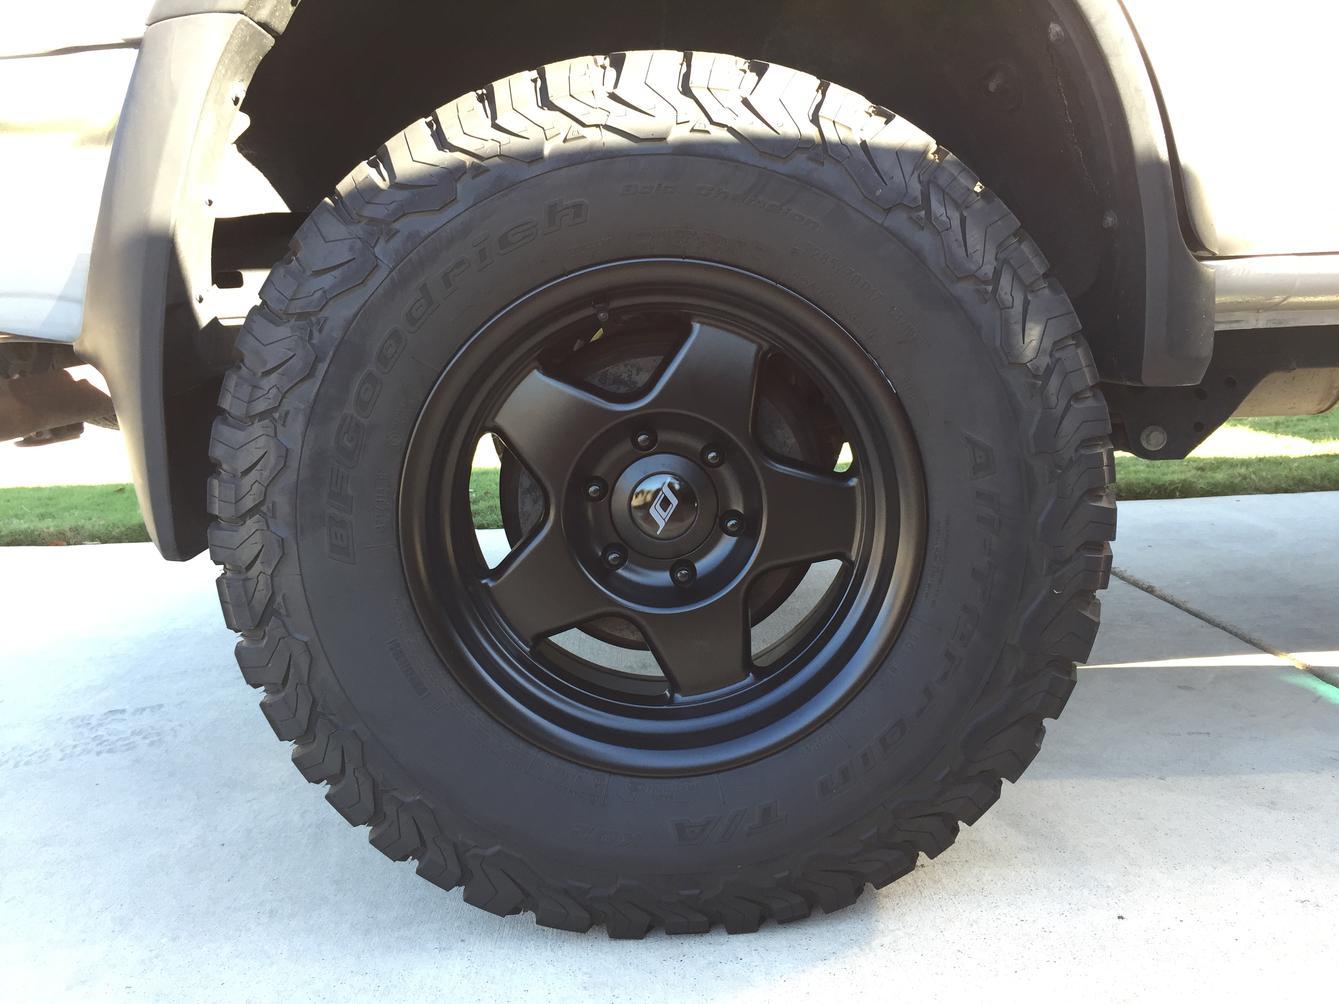 4xSCS F5 17x8 5 wheels Austin, Tx - Toyota 4Runner Forum